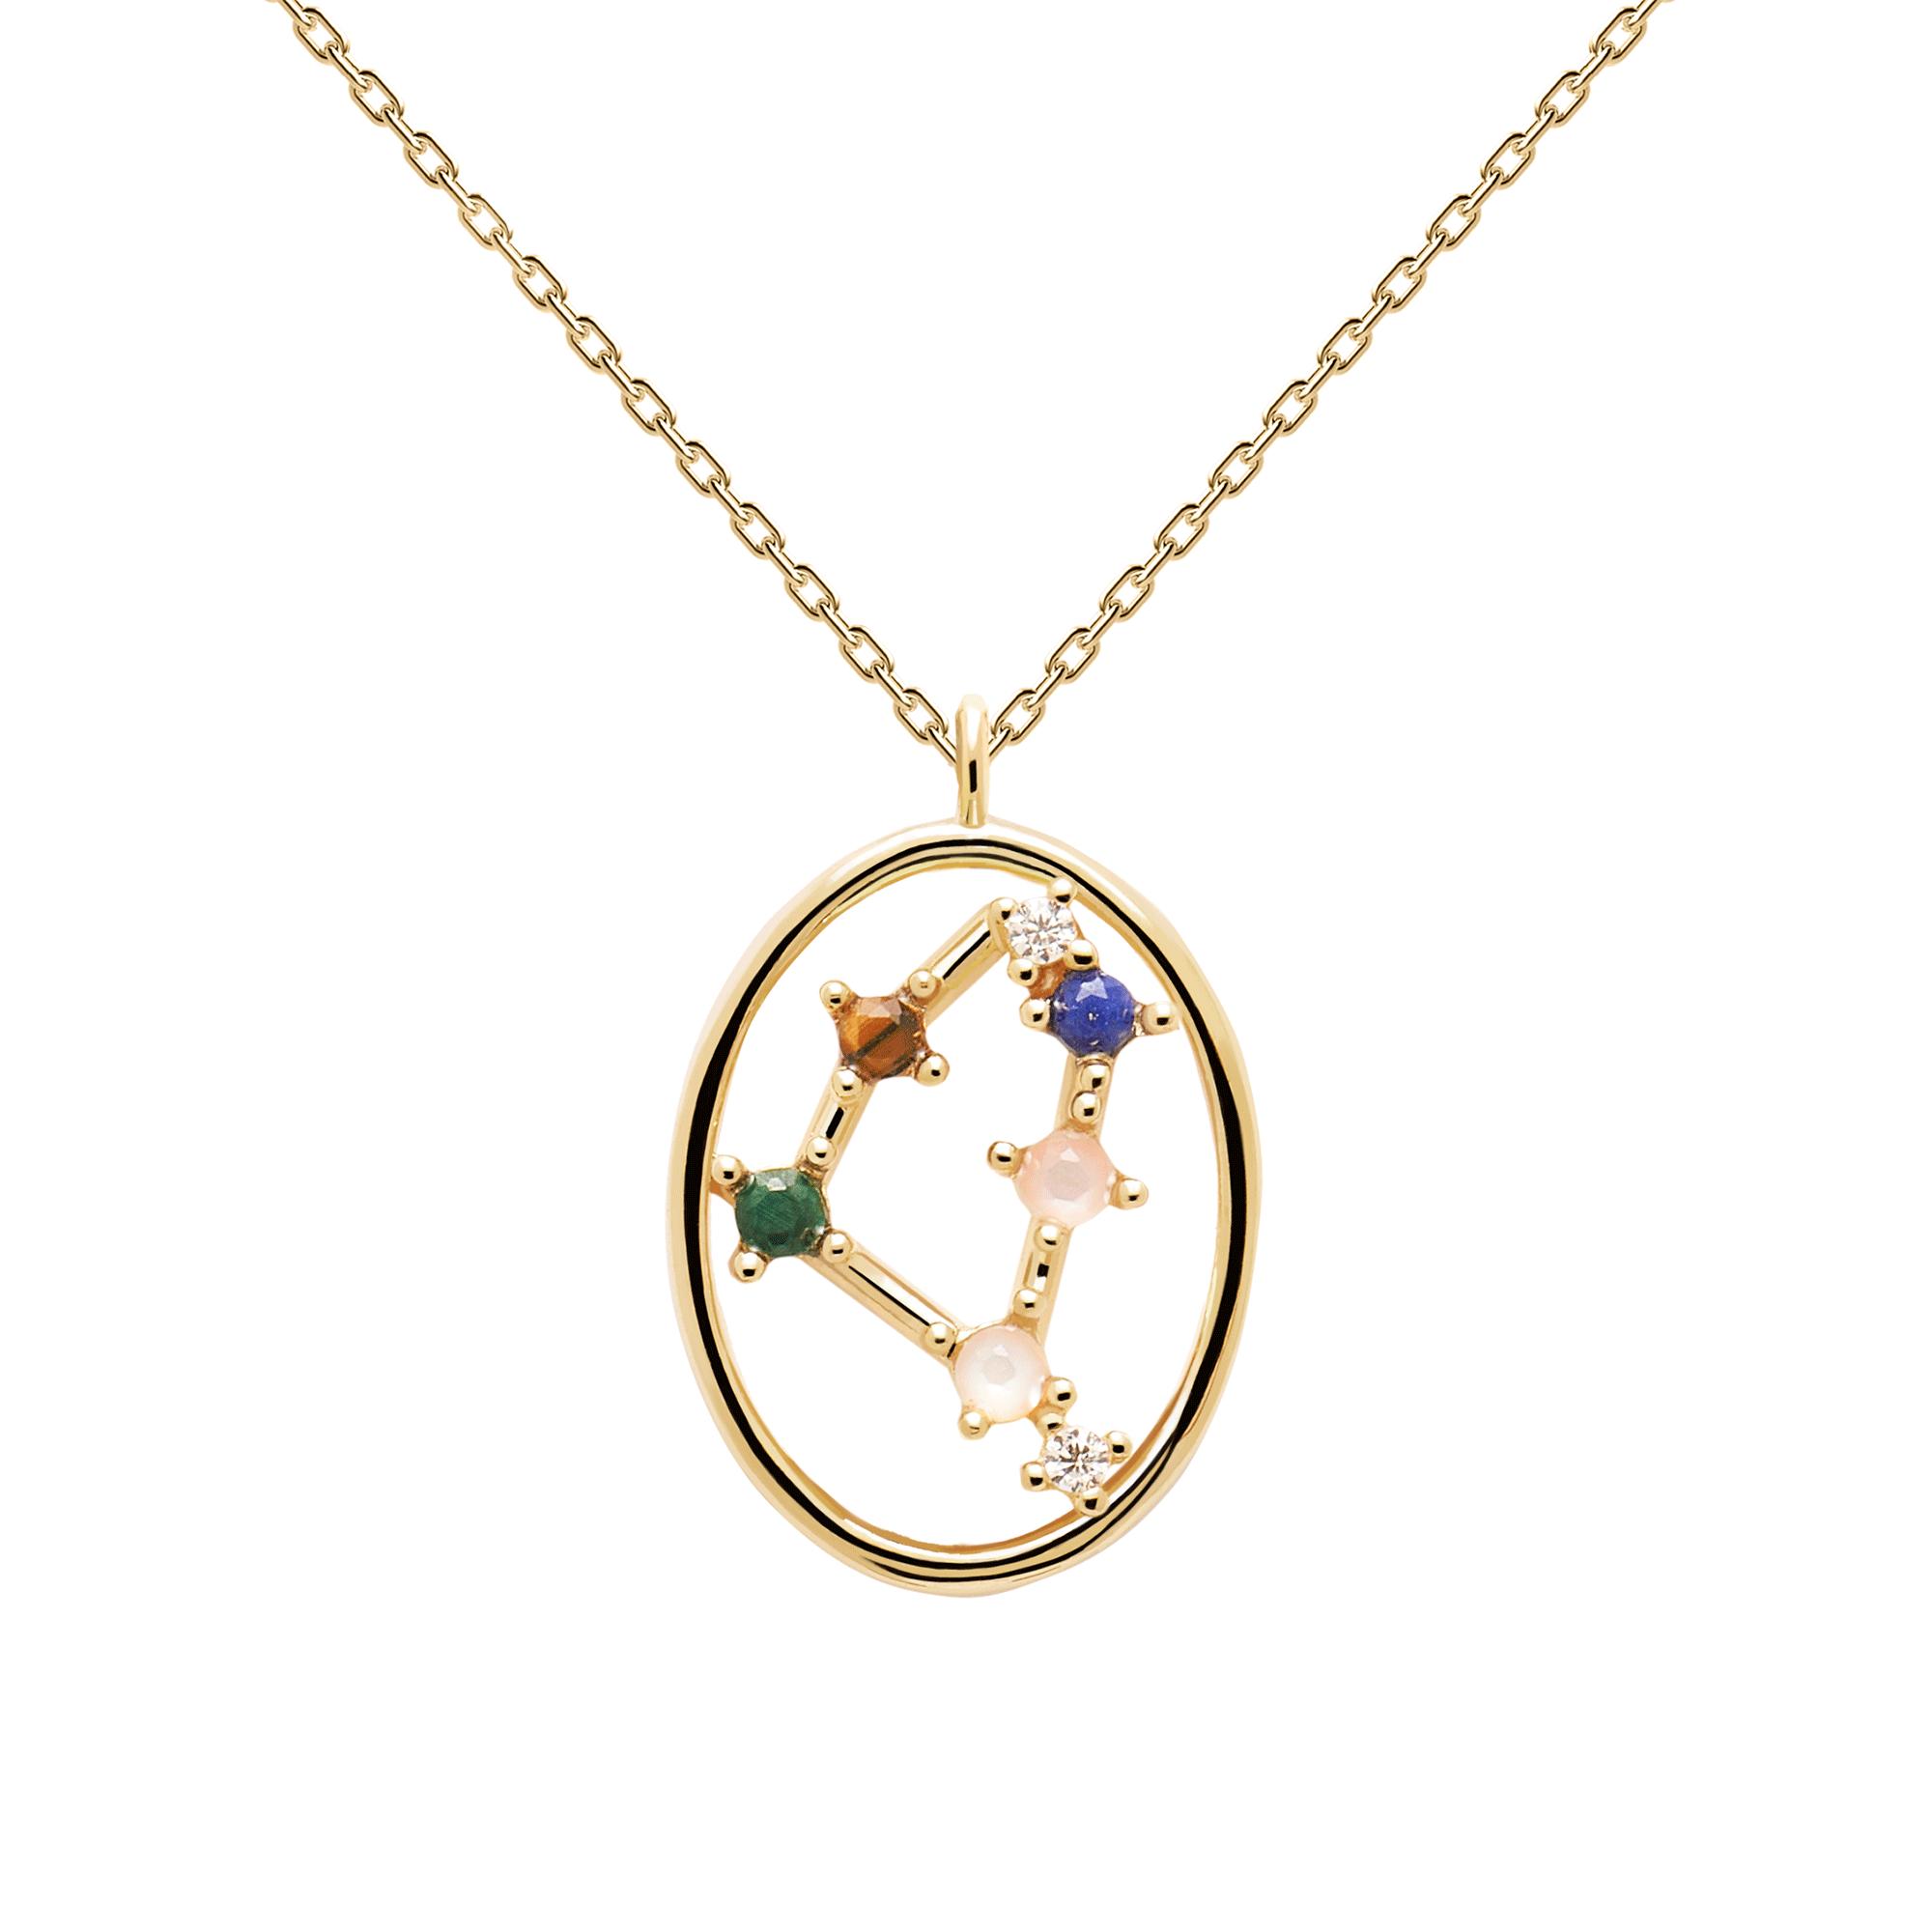 Zodiac Constellations Necklaces